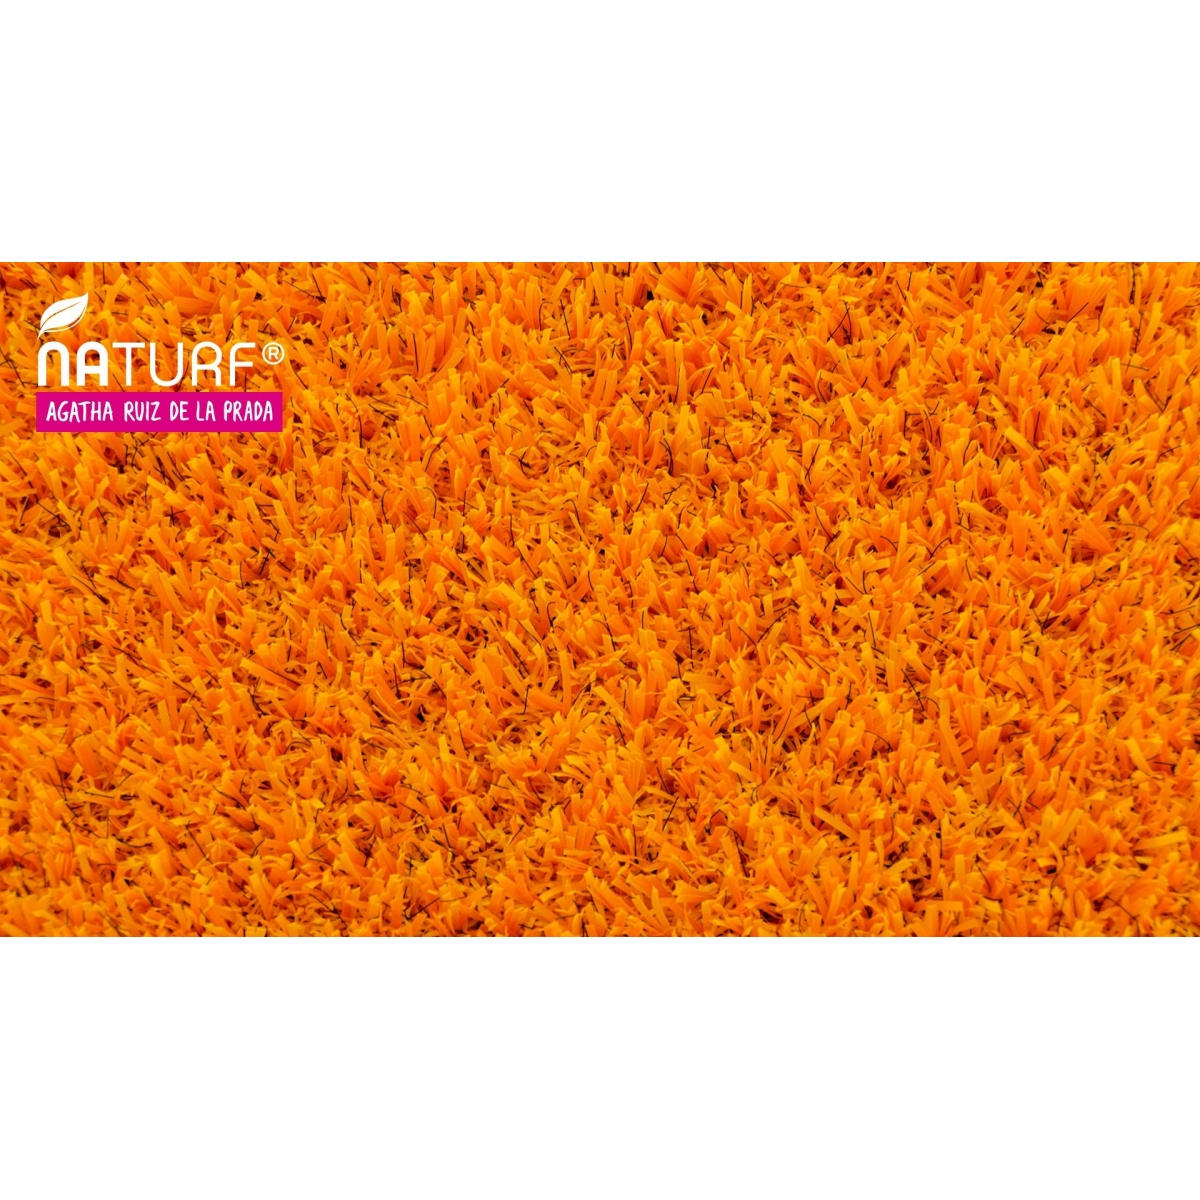 Cesped artificial Naranja Serie Agatha